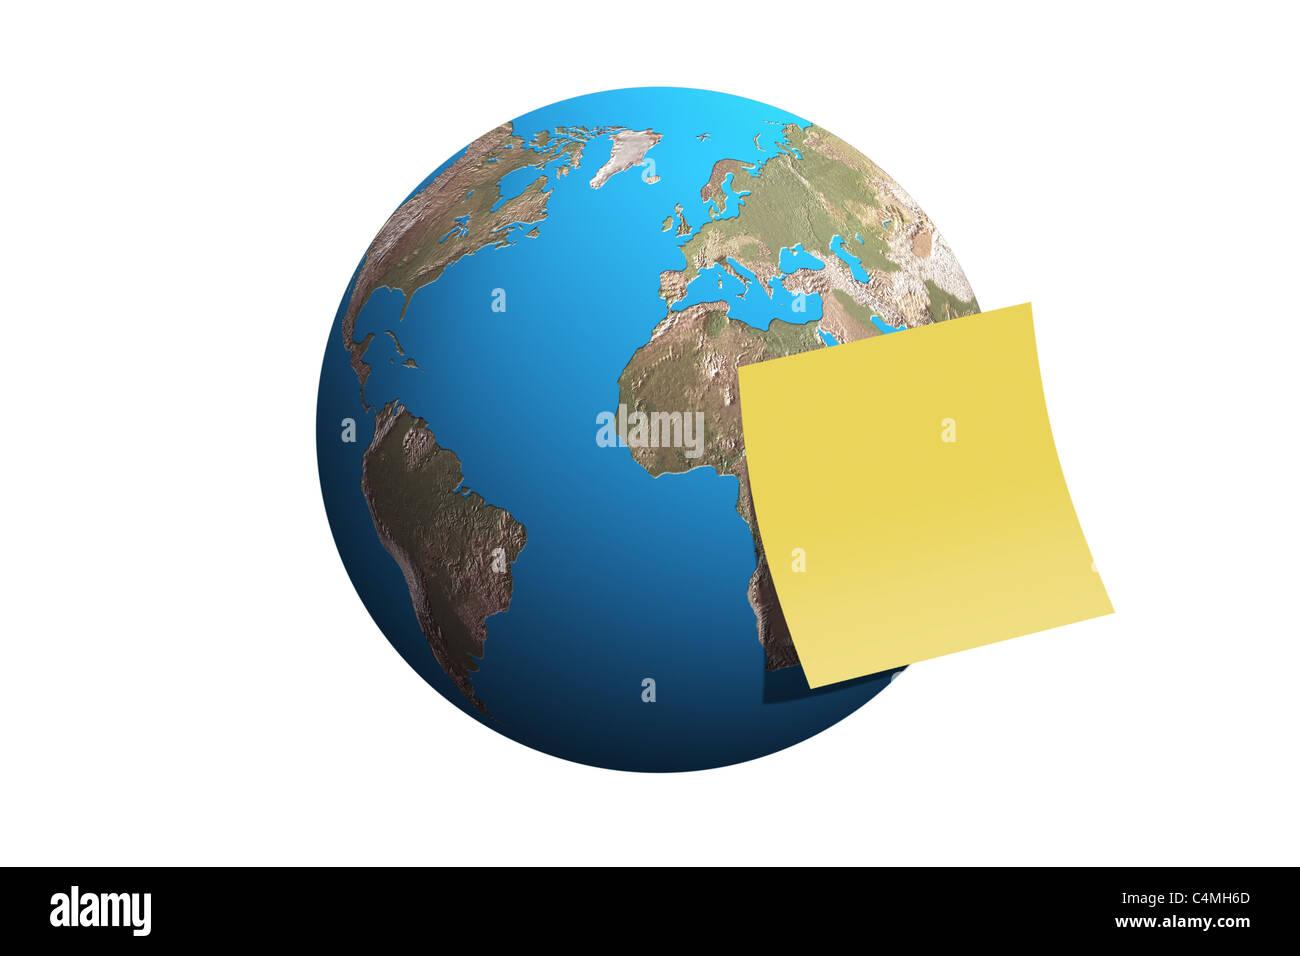 Earth World Globe Sphere - Stock Image